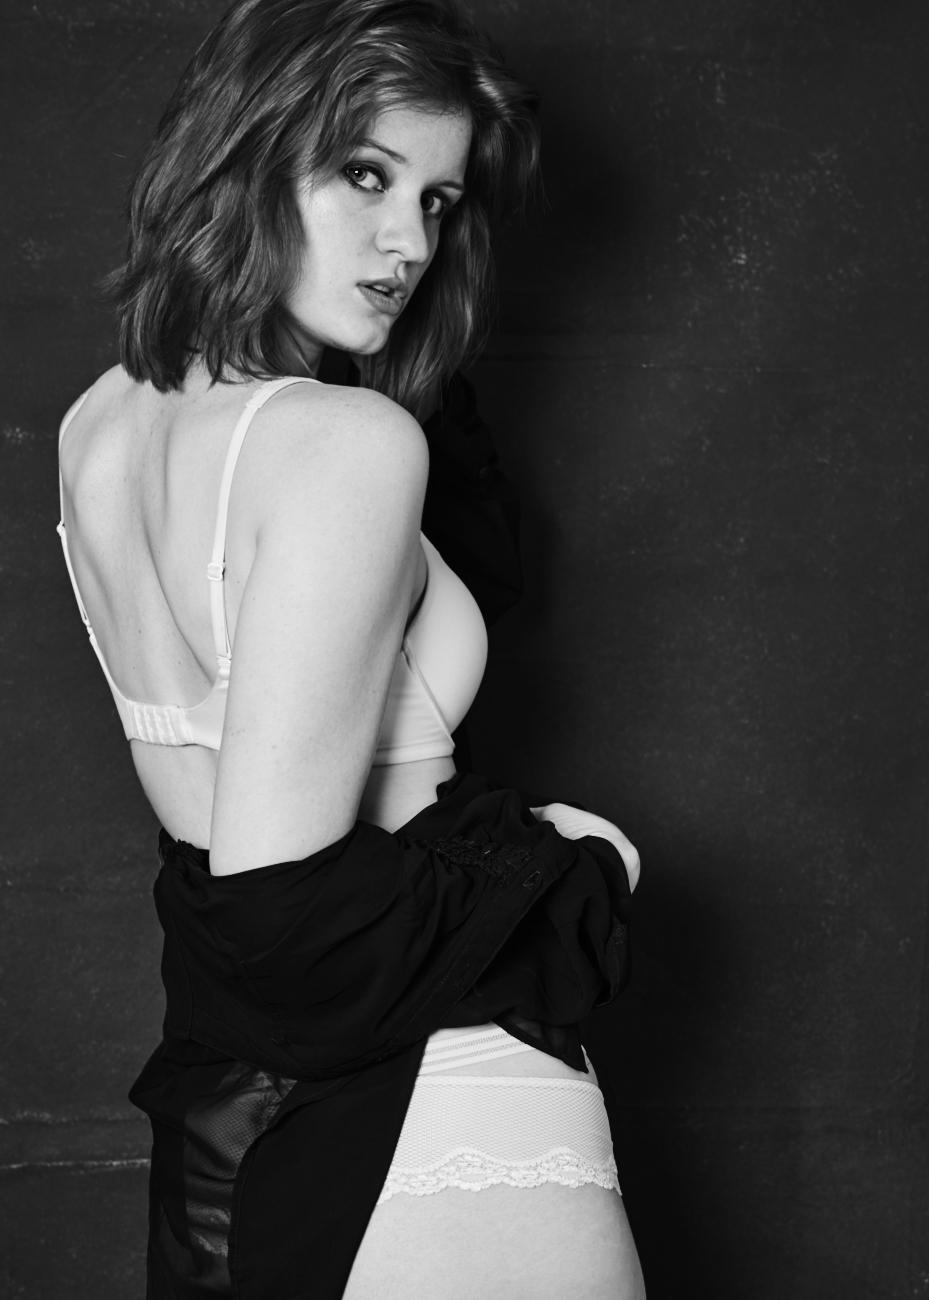 www.juliemoorephotography.com